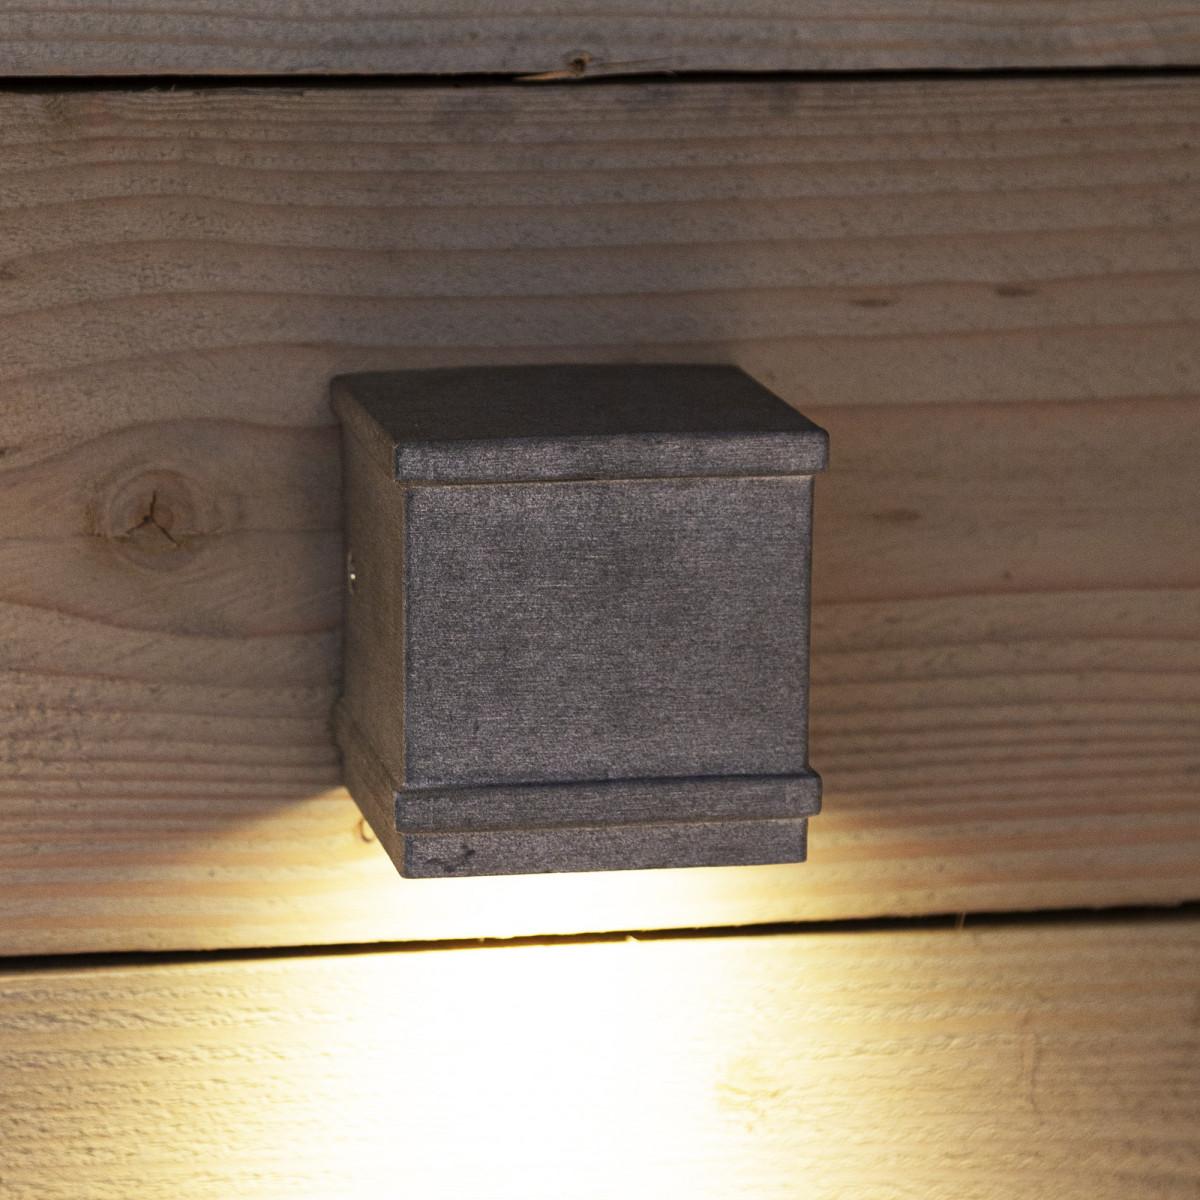 Borgo wandspot ruw aluminium (6687) - KS Verlichting